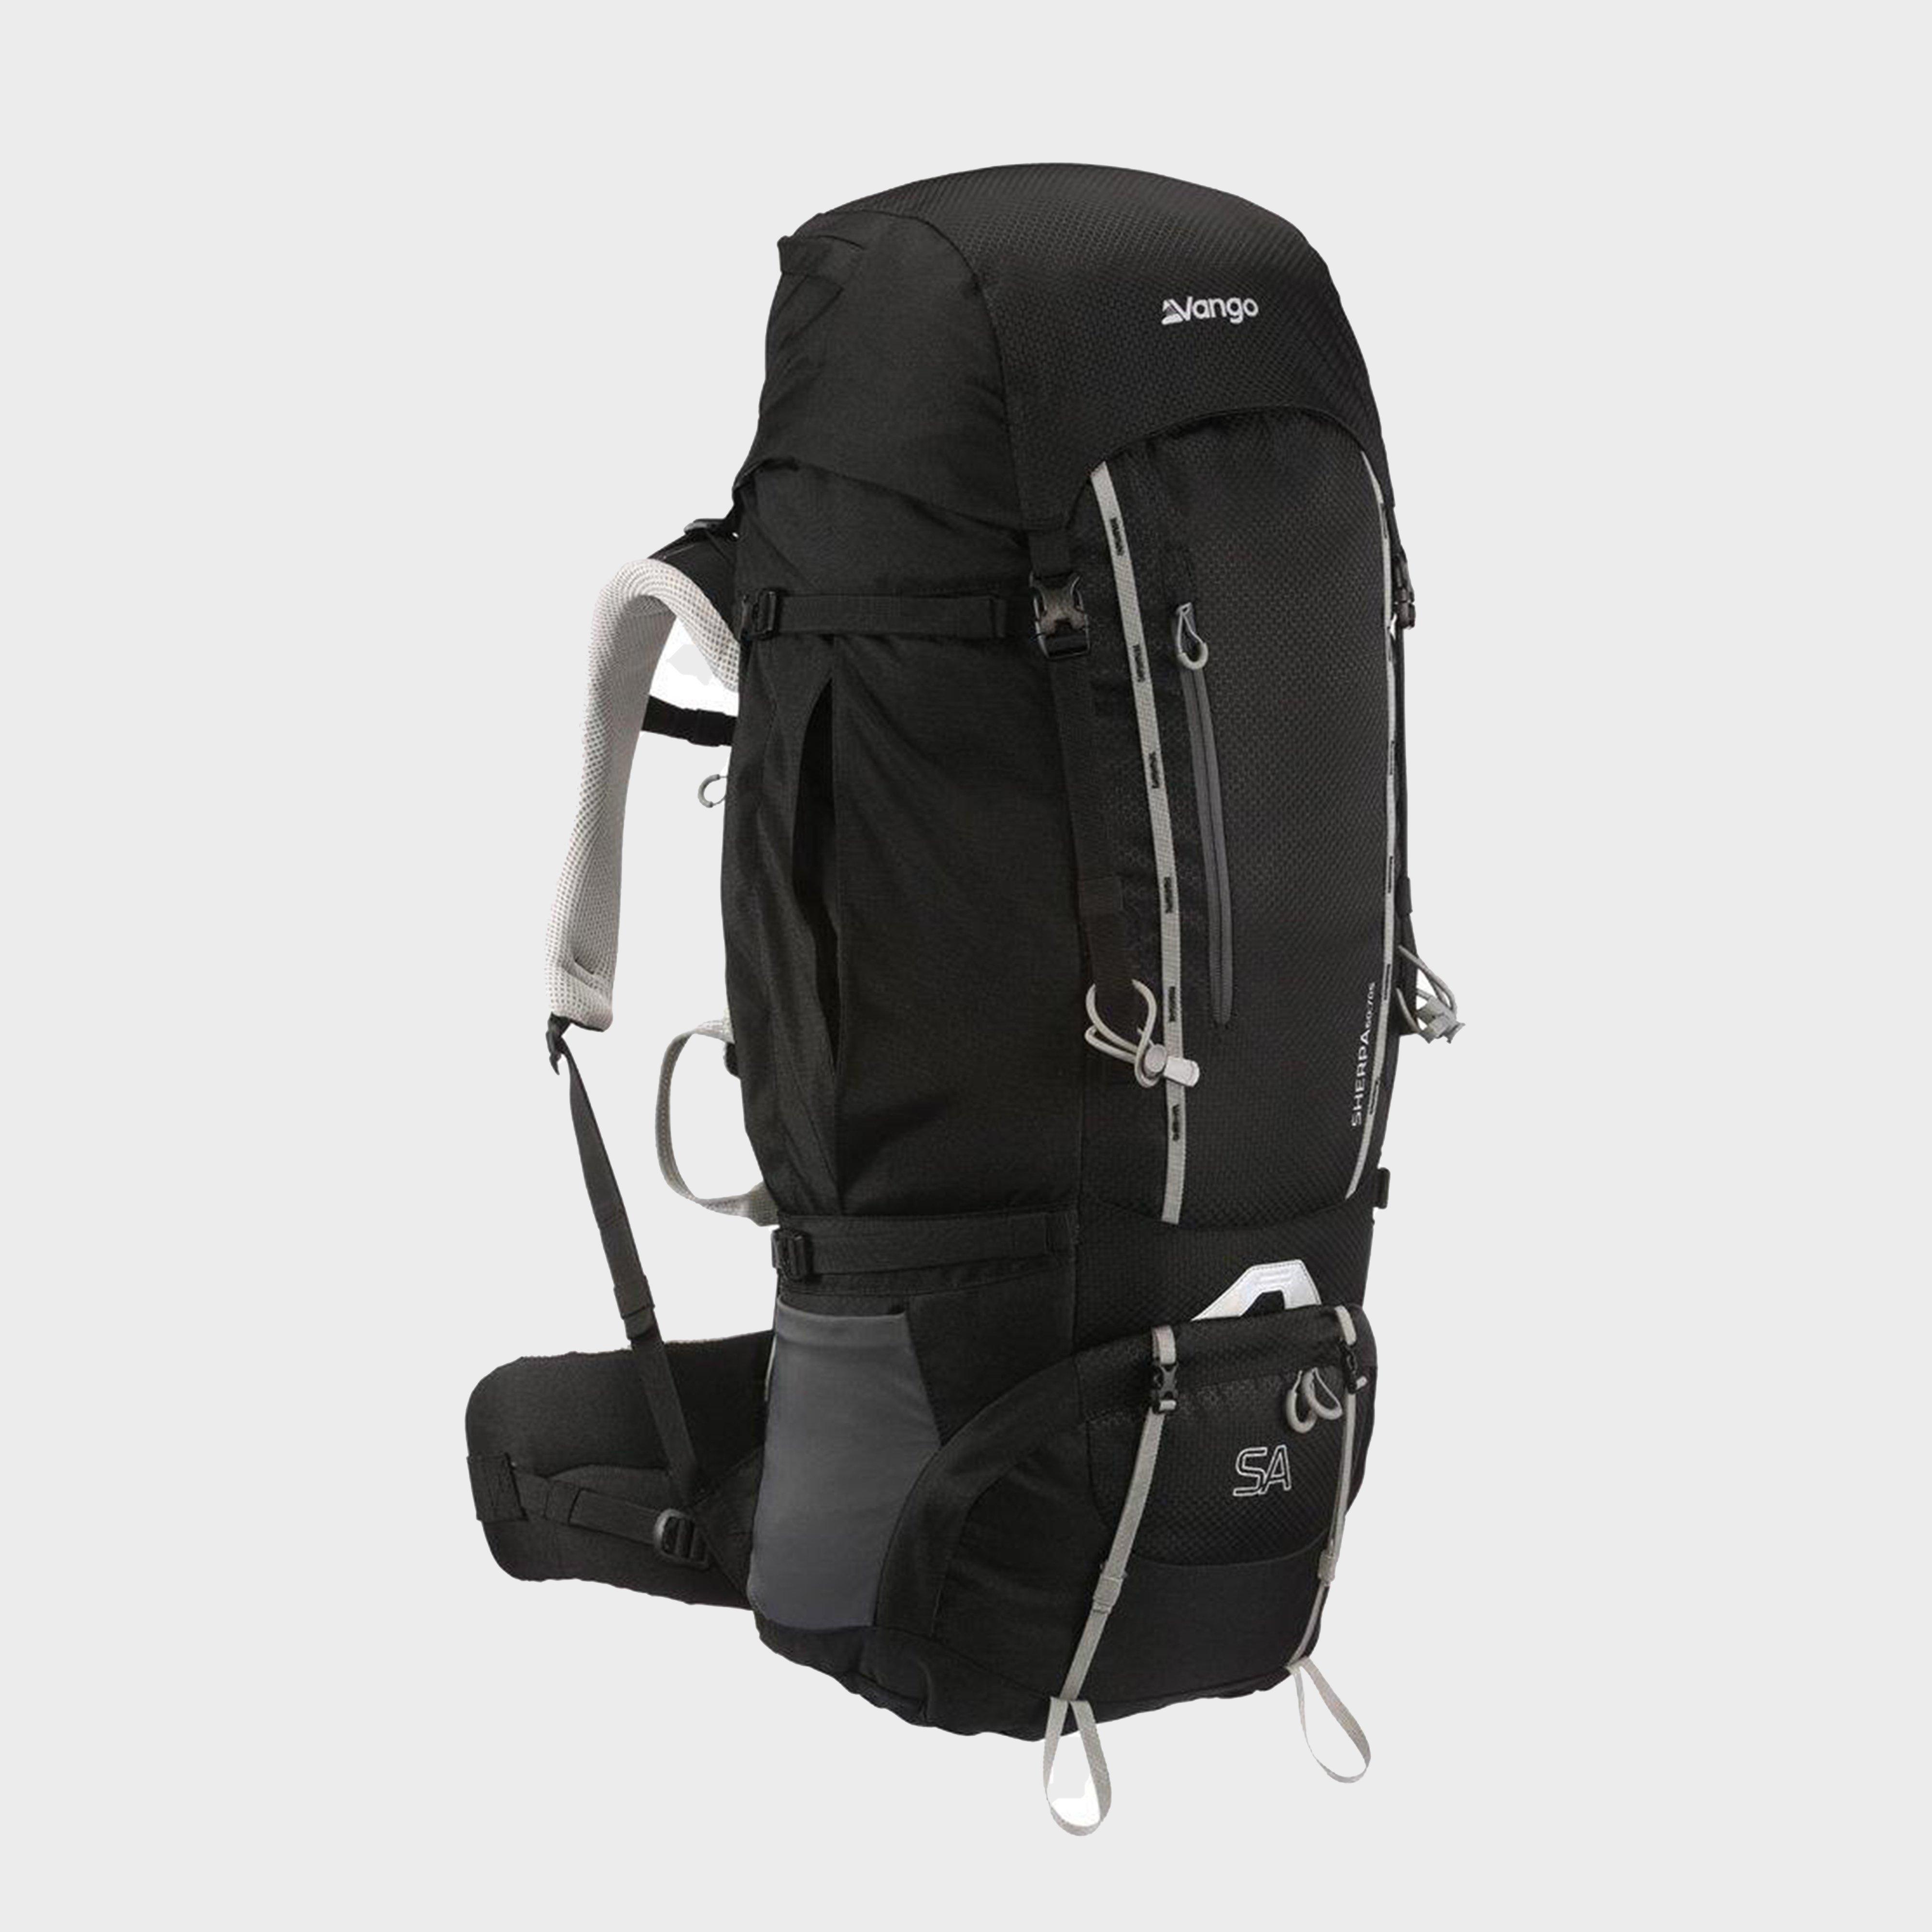 Vango Sherpa 60:70 Rucksack - Black/70S, Black